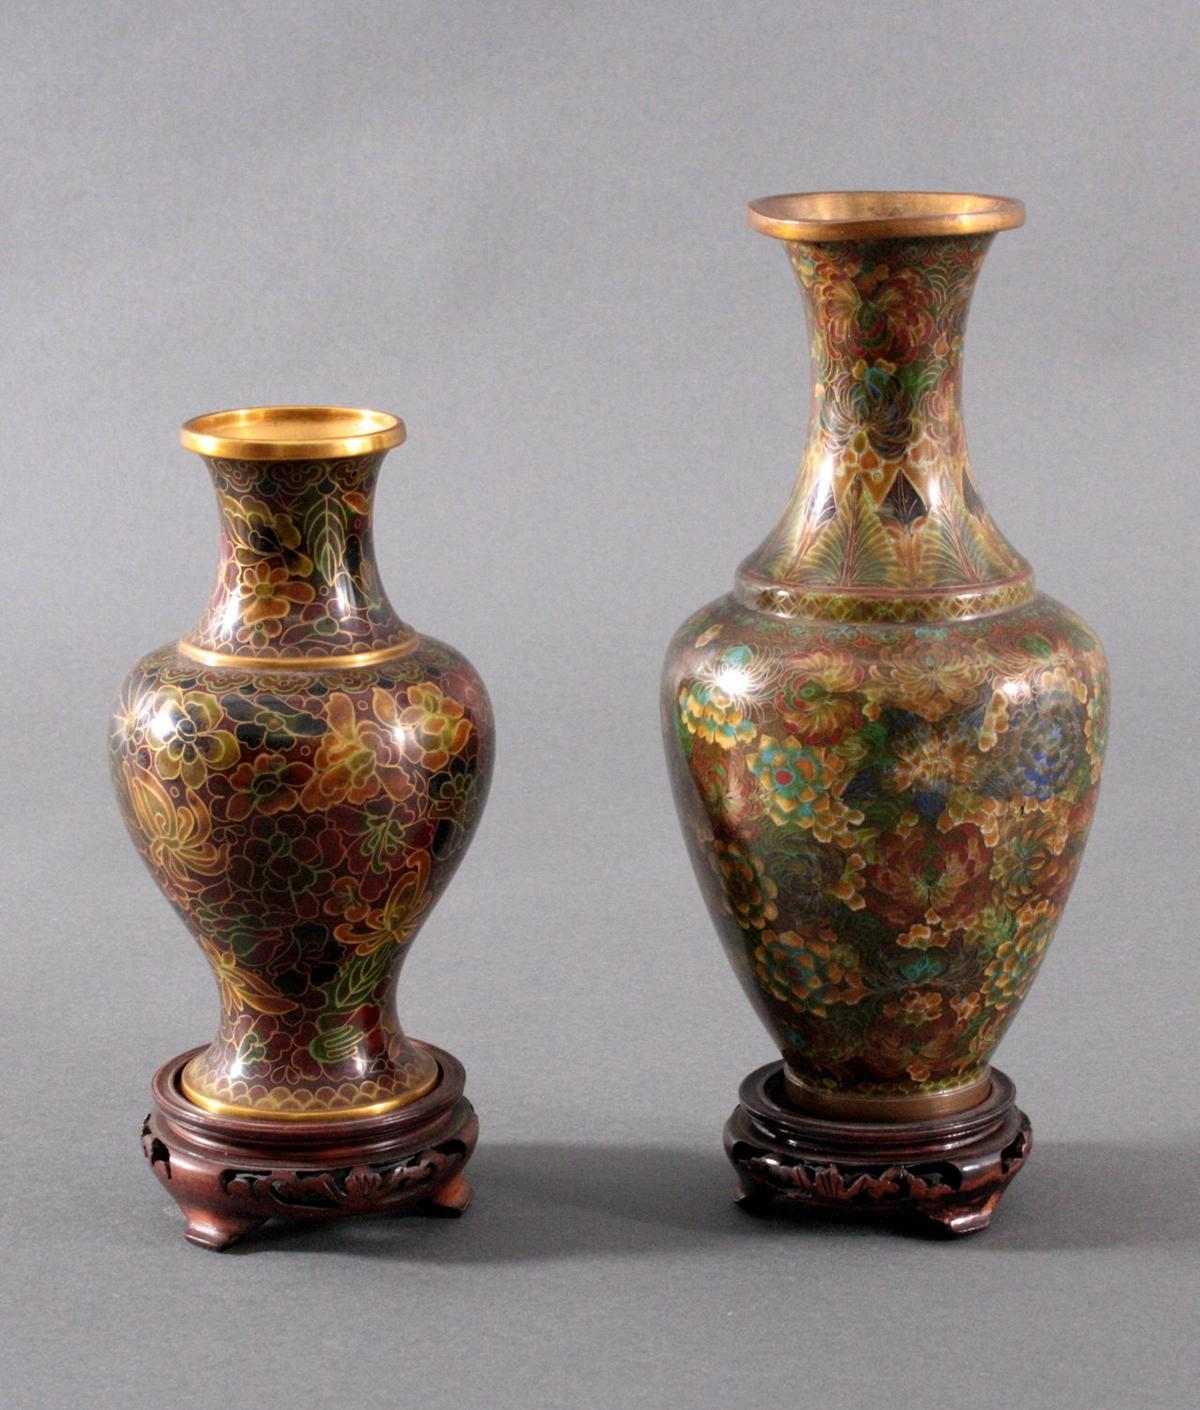 Zwei Cloisonné-Vasen